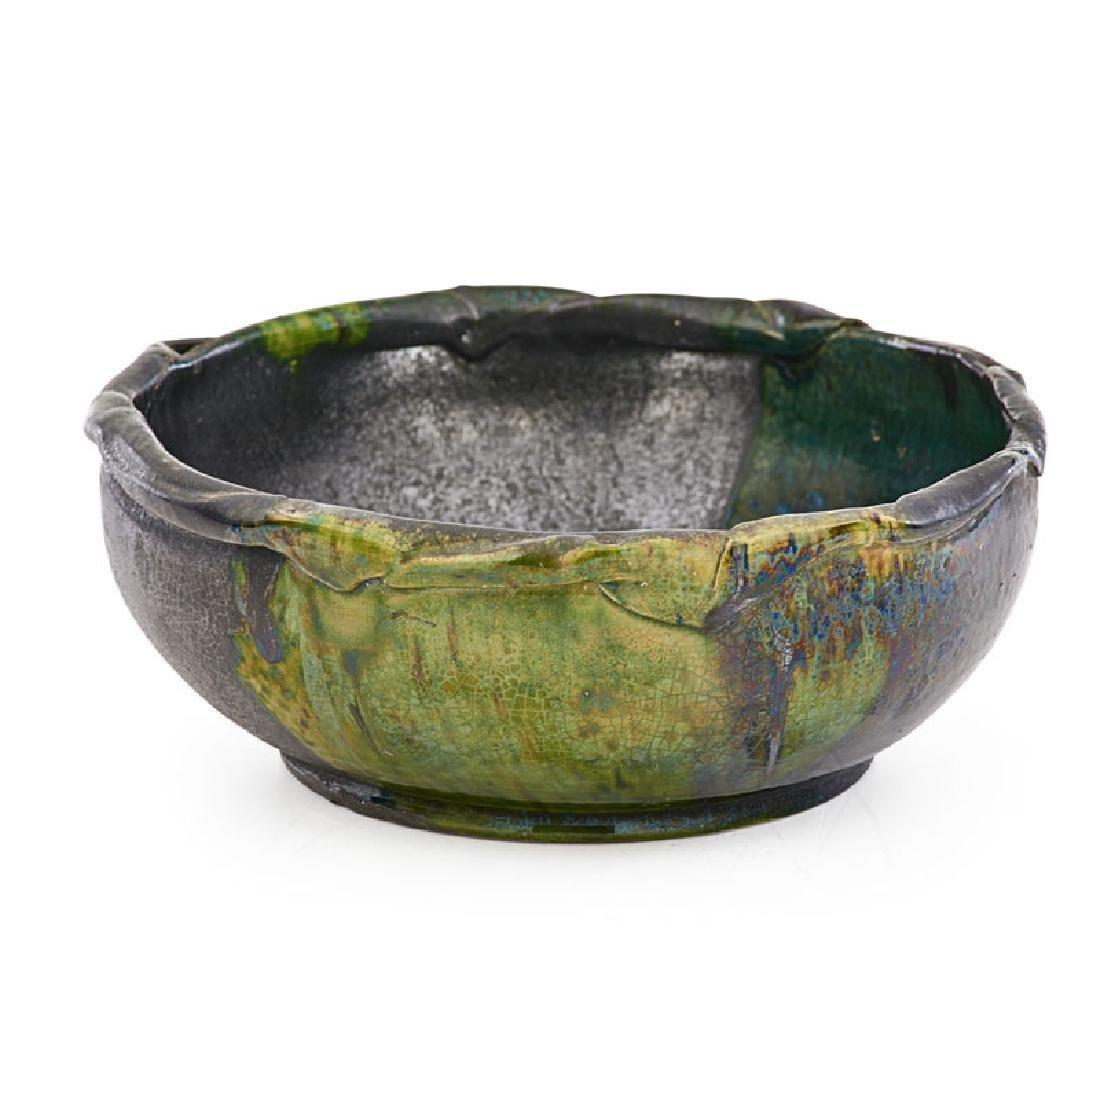 GEORGE OHR Large bowl, folded rim